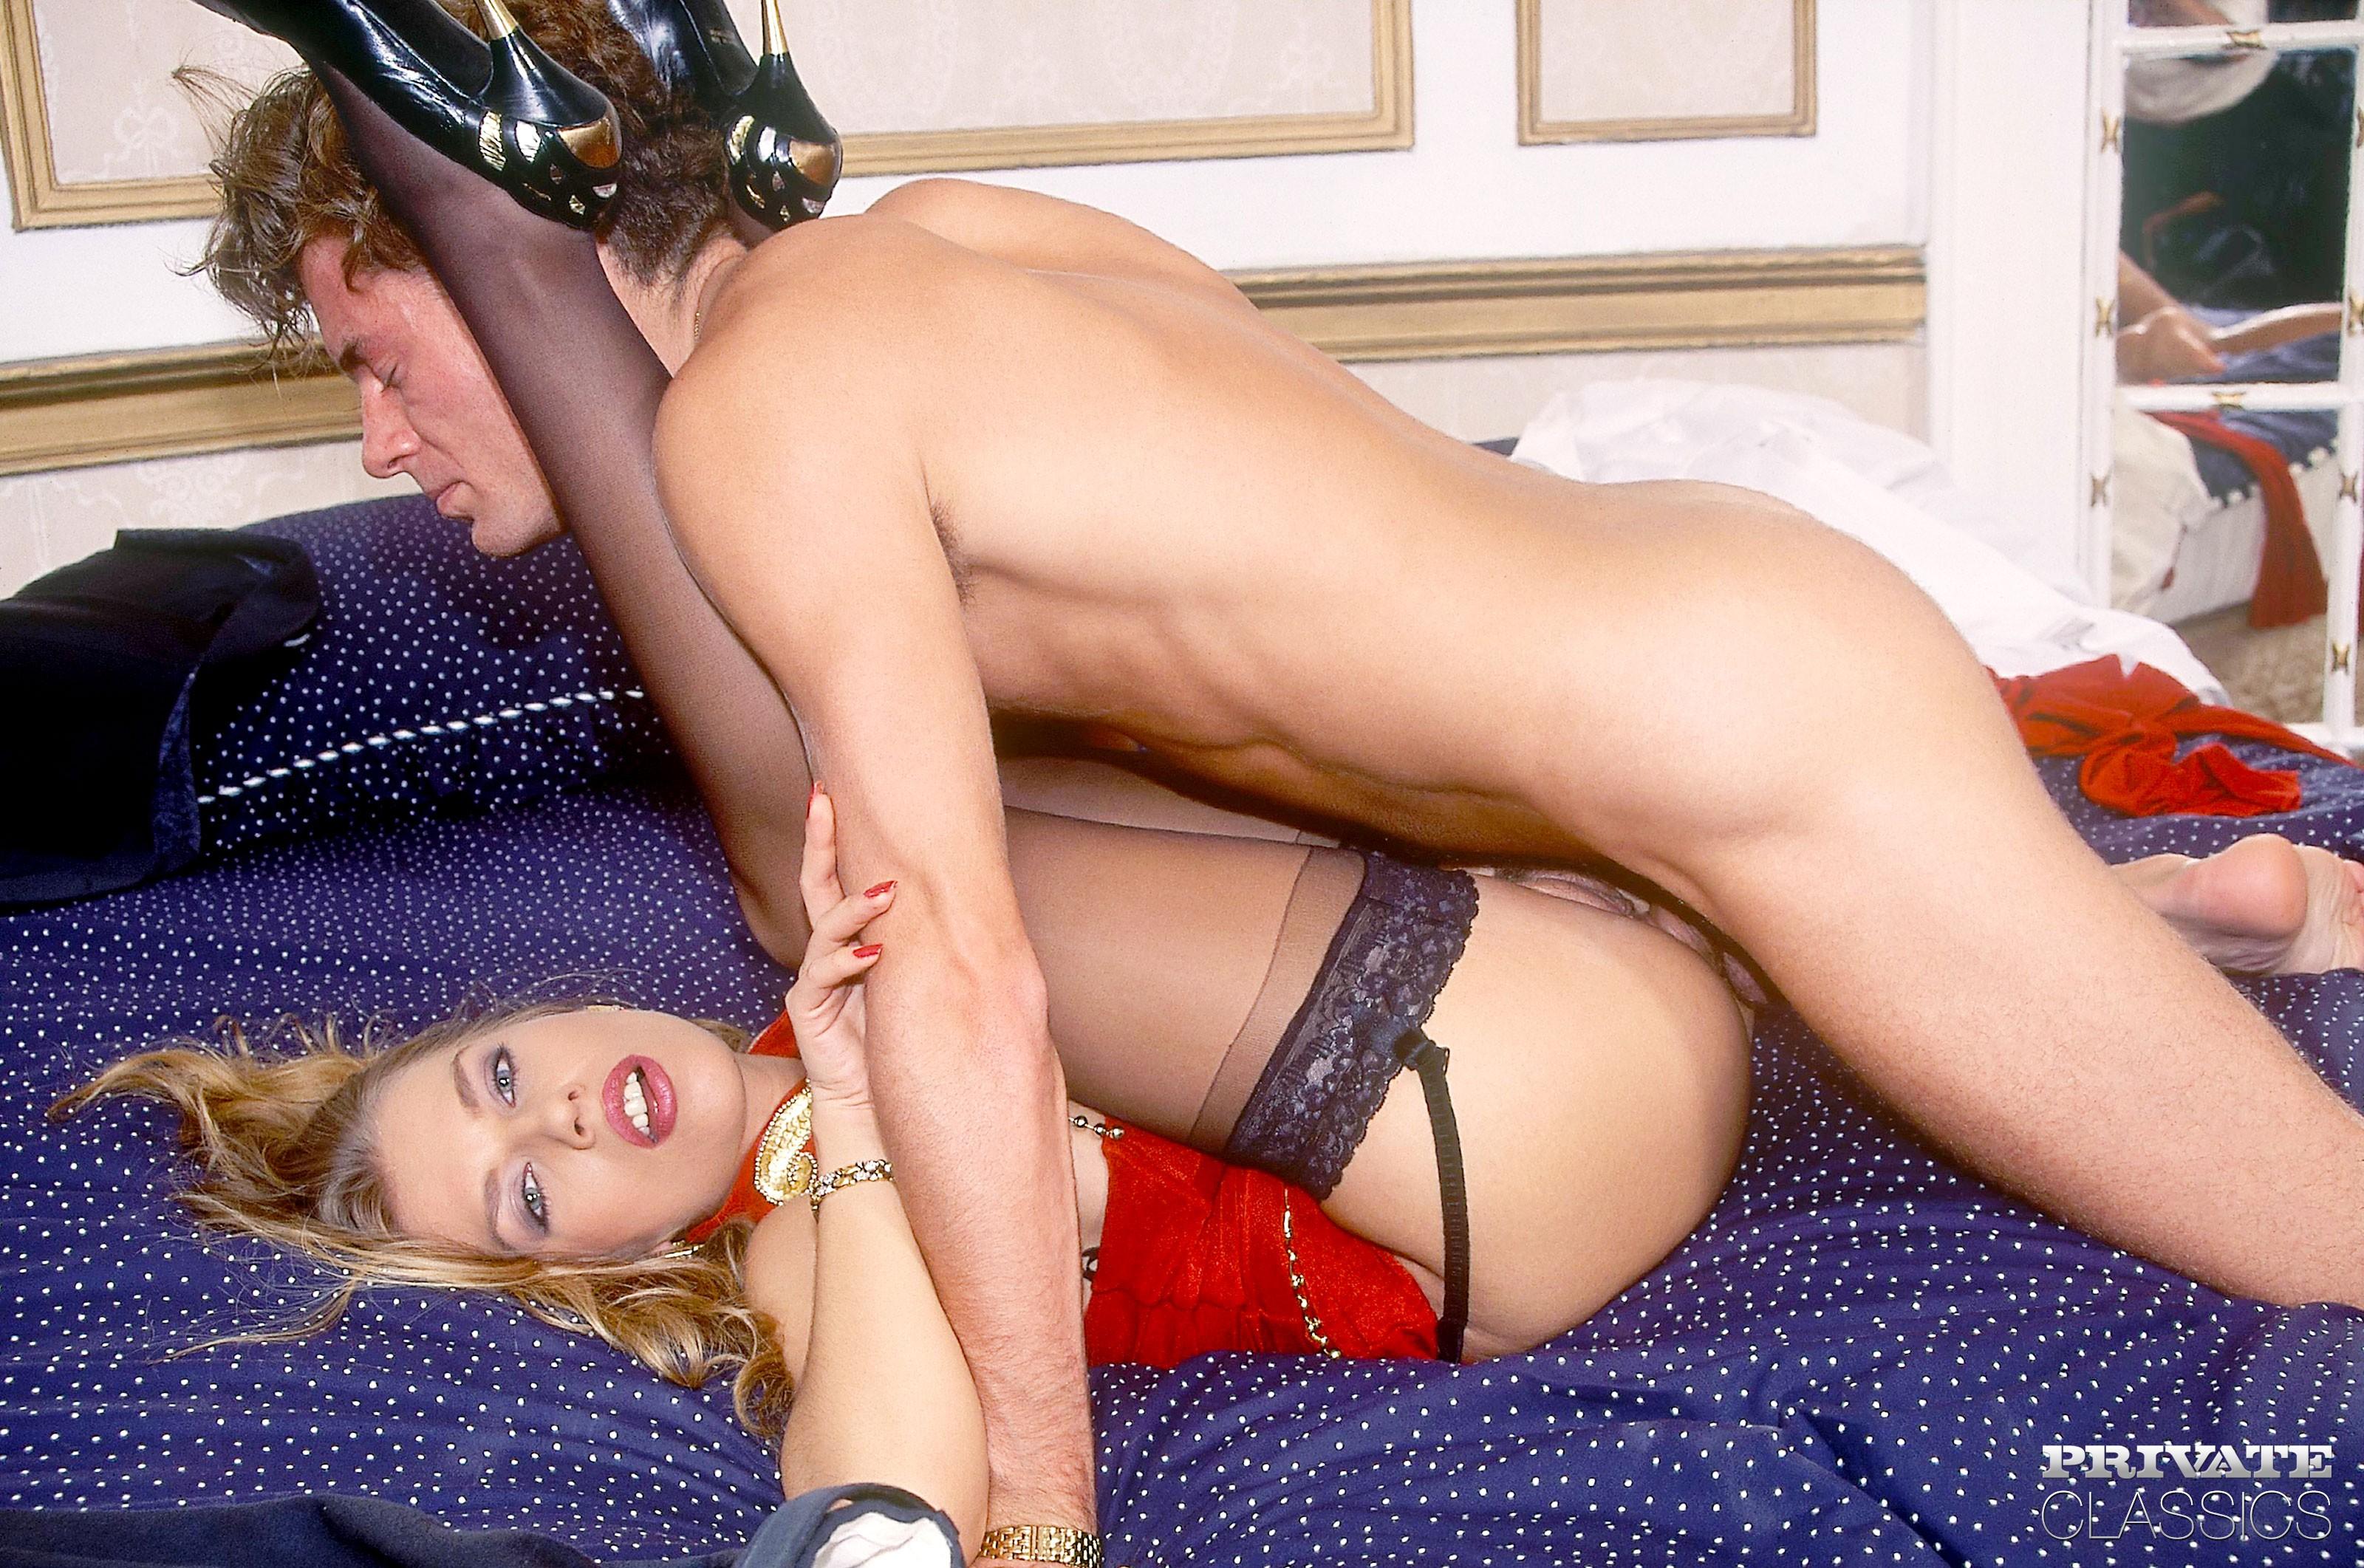 public indecency porn tgp